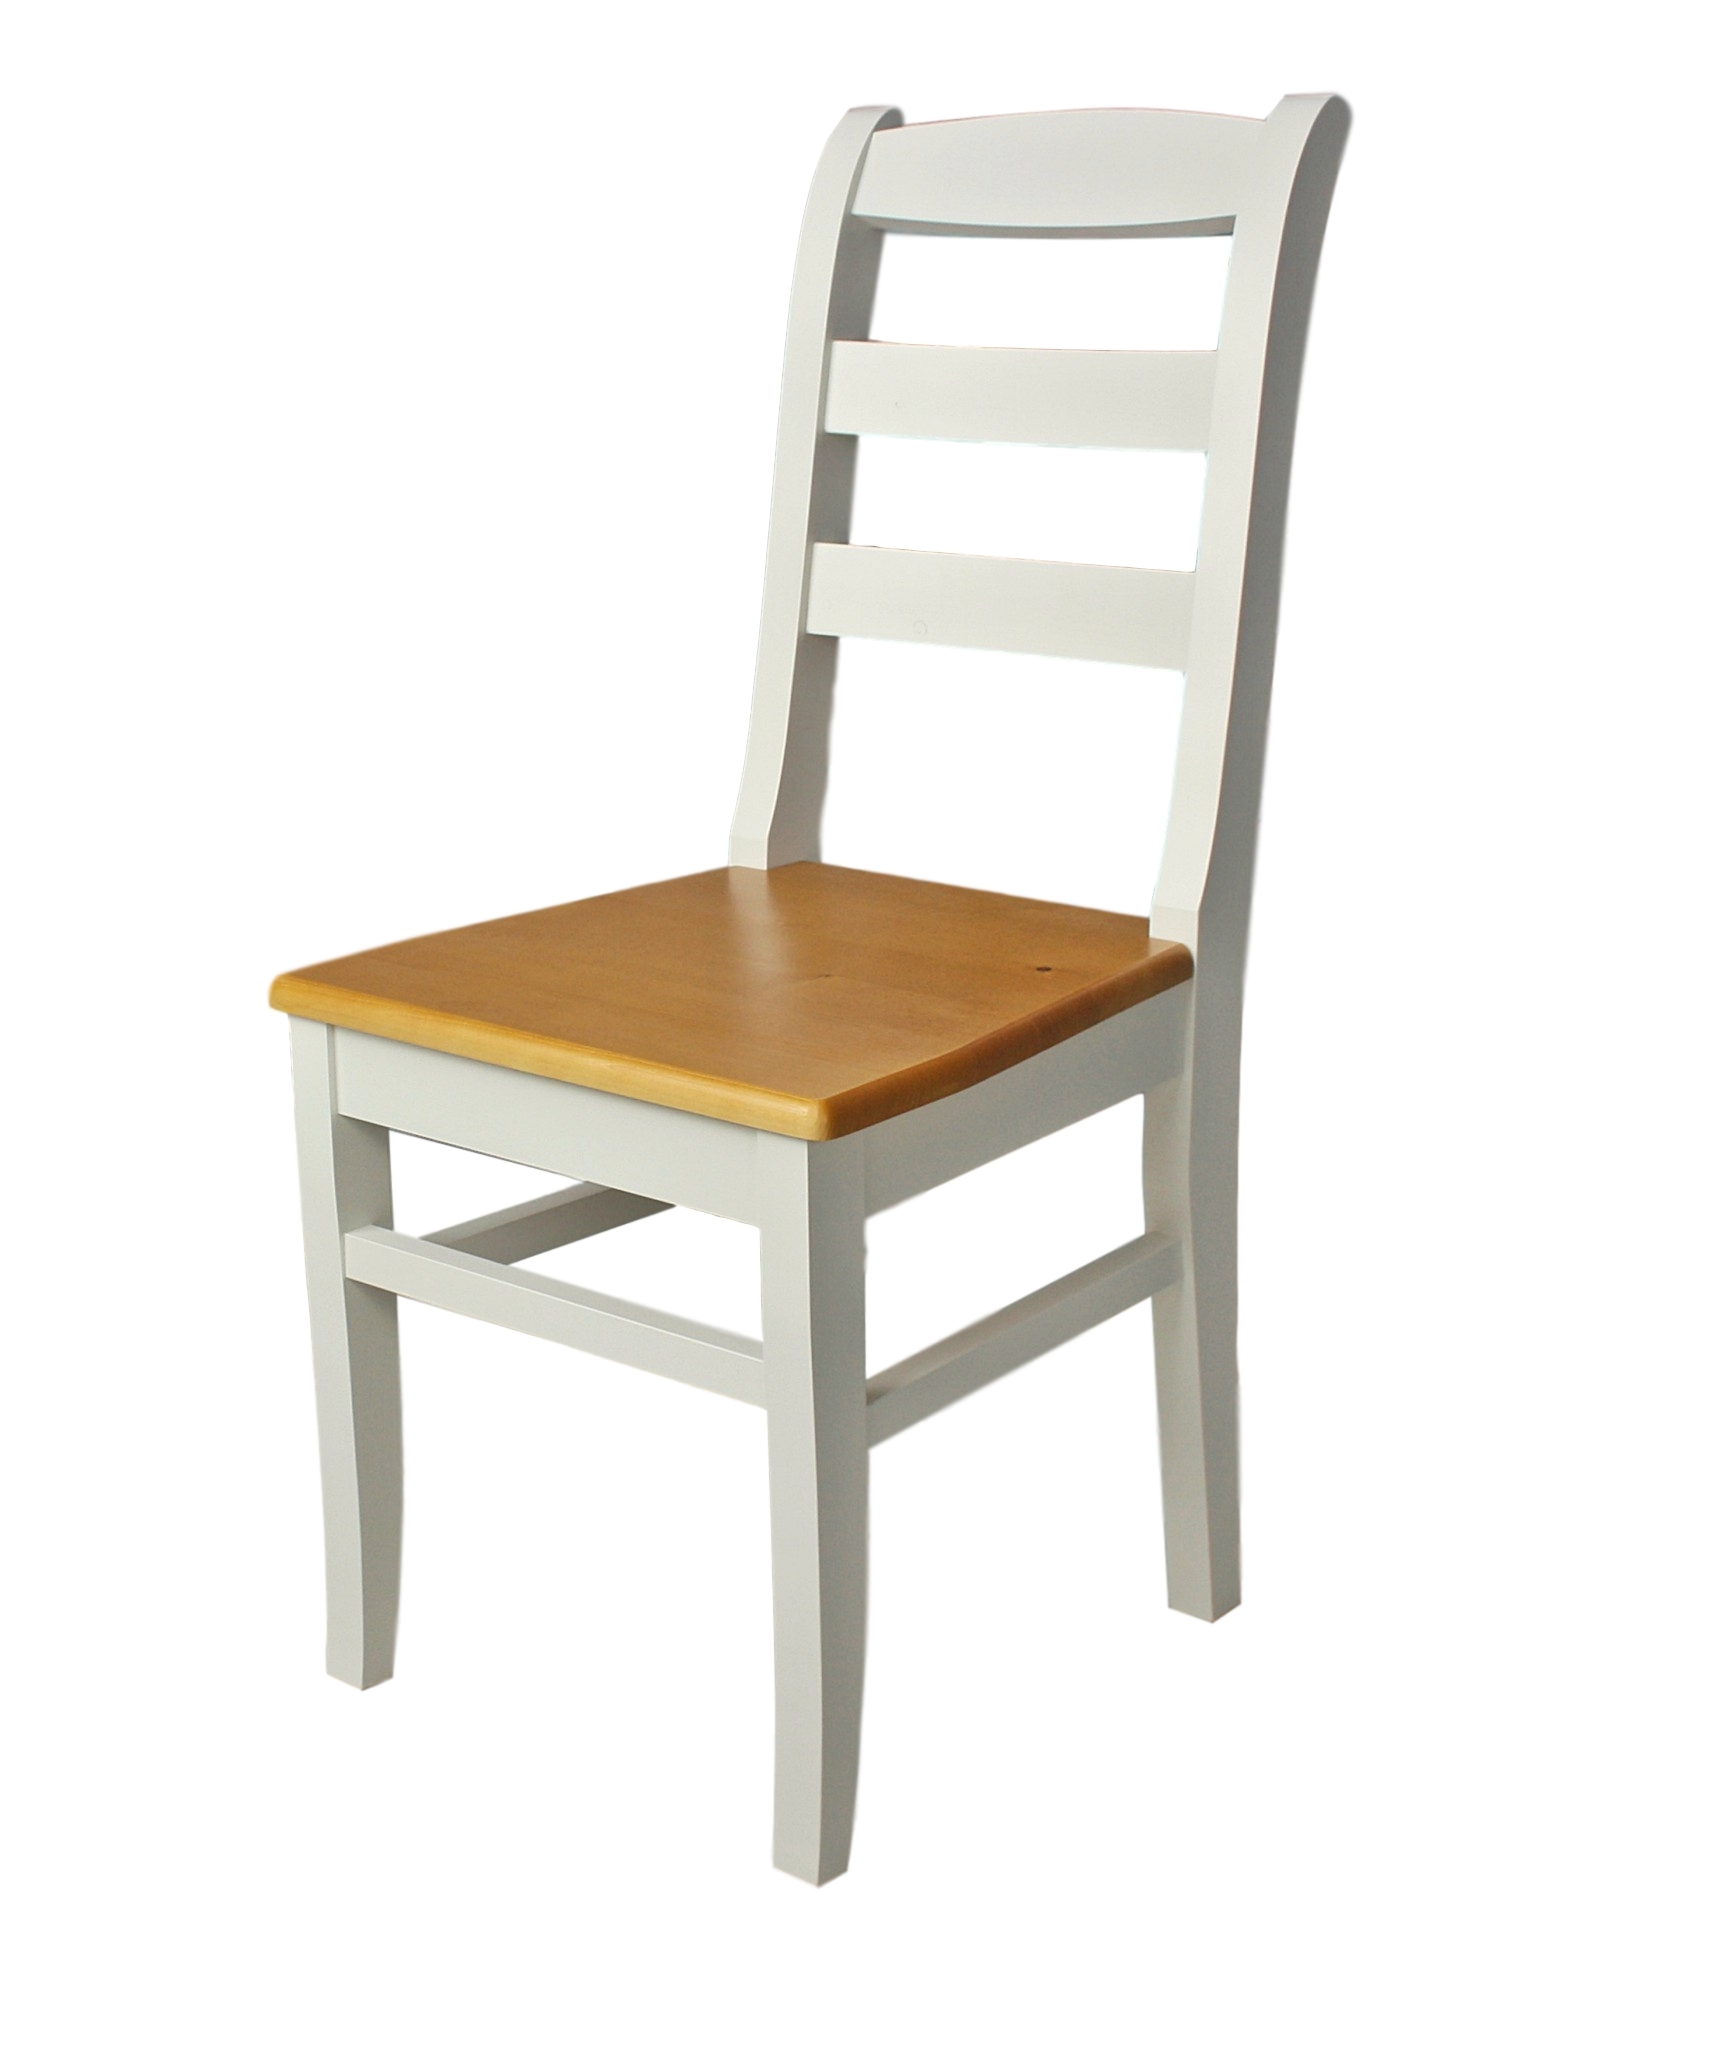 Stuhl Weiss Barockstuhl Küchenstuhl Eszimmerstuhl Polsterstuhl Landhausstil